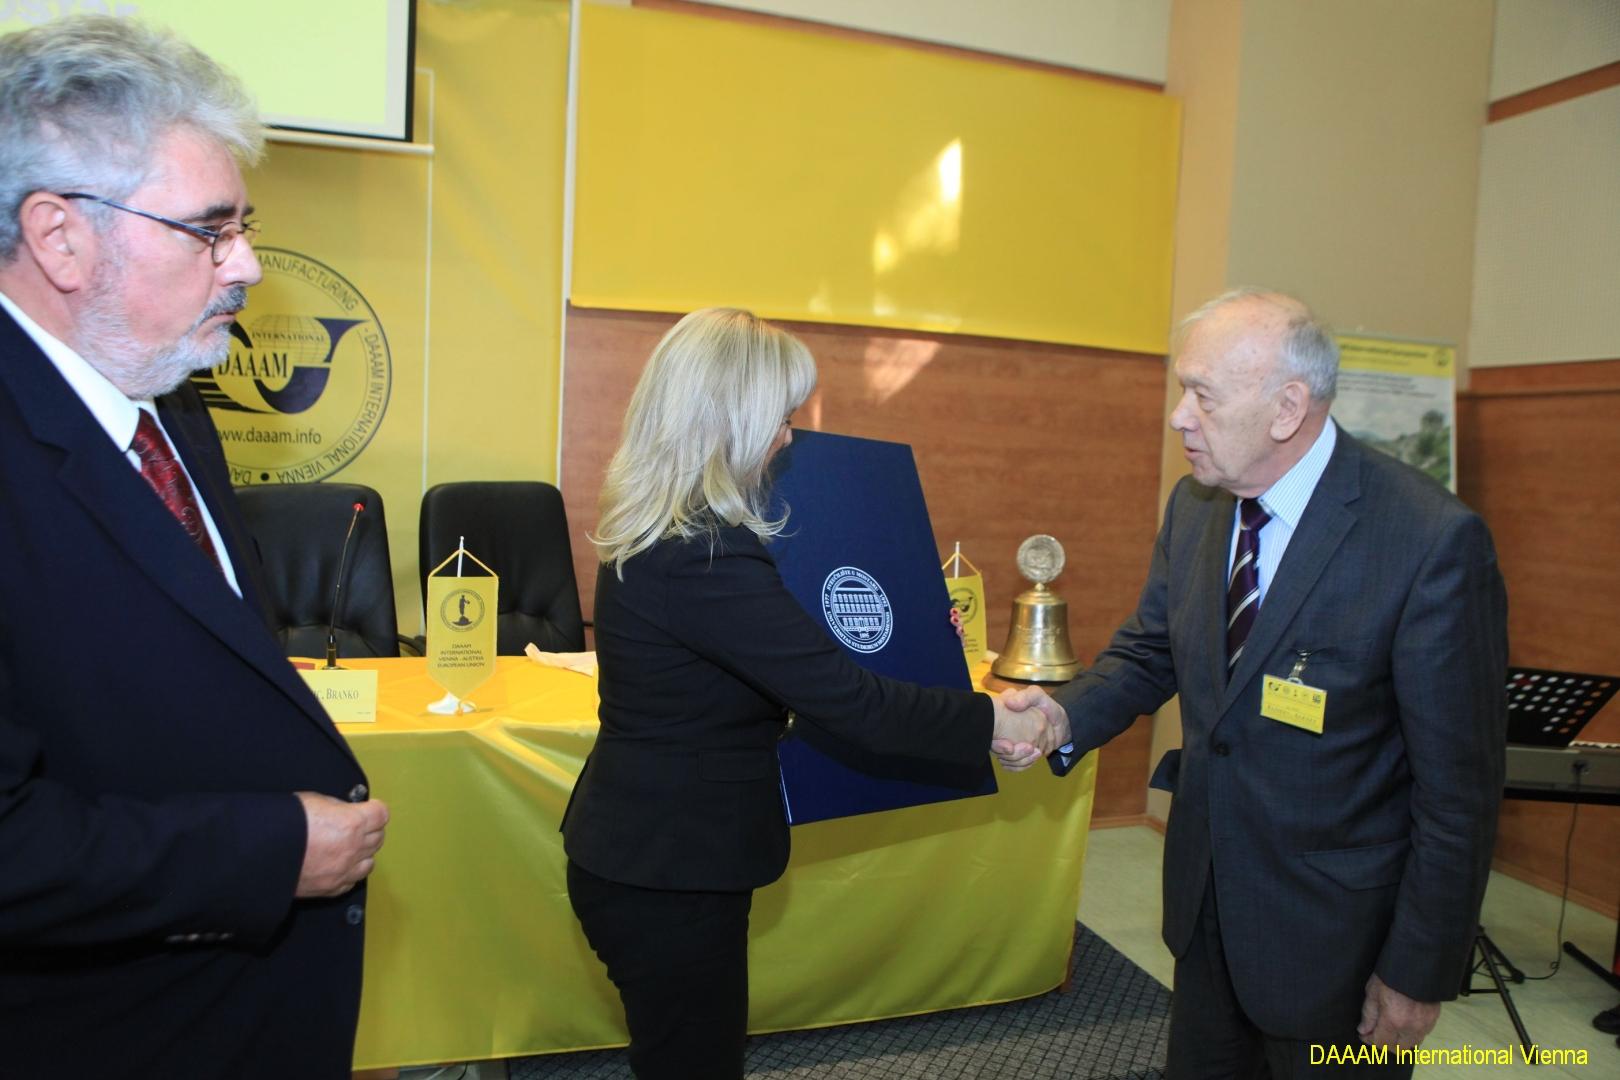 DAAAM_2016_Mostar_06_Professor_and_Cosmonaut_Alexey_Eliseev_Doctor_honors_causa_003